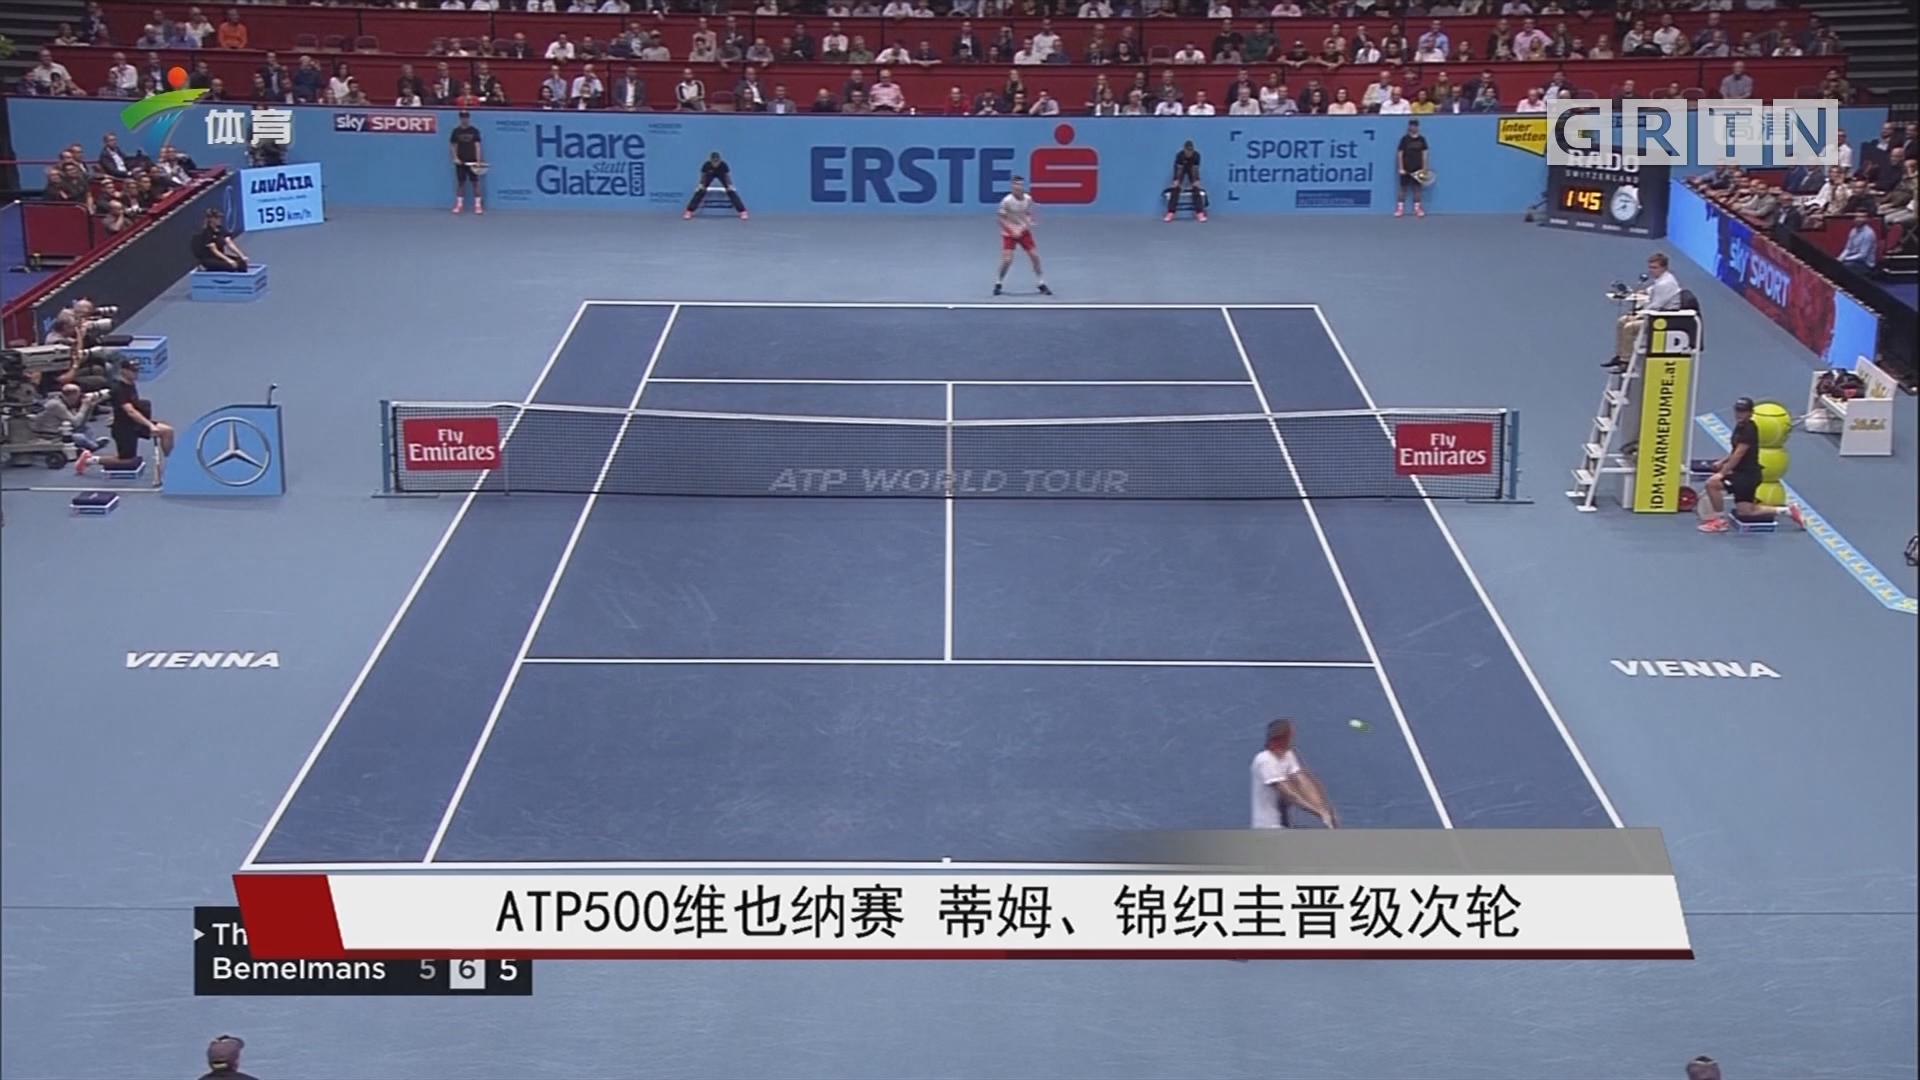 ATP500维也纳赛 蒂姆、锦织圭晋级次轮